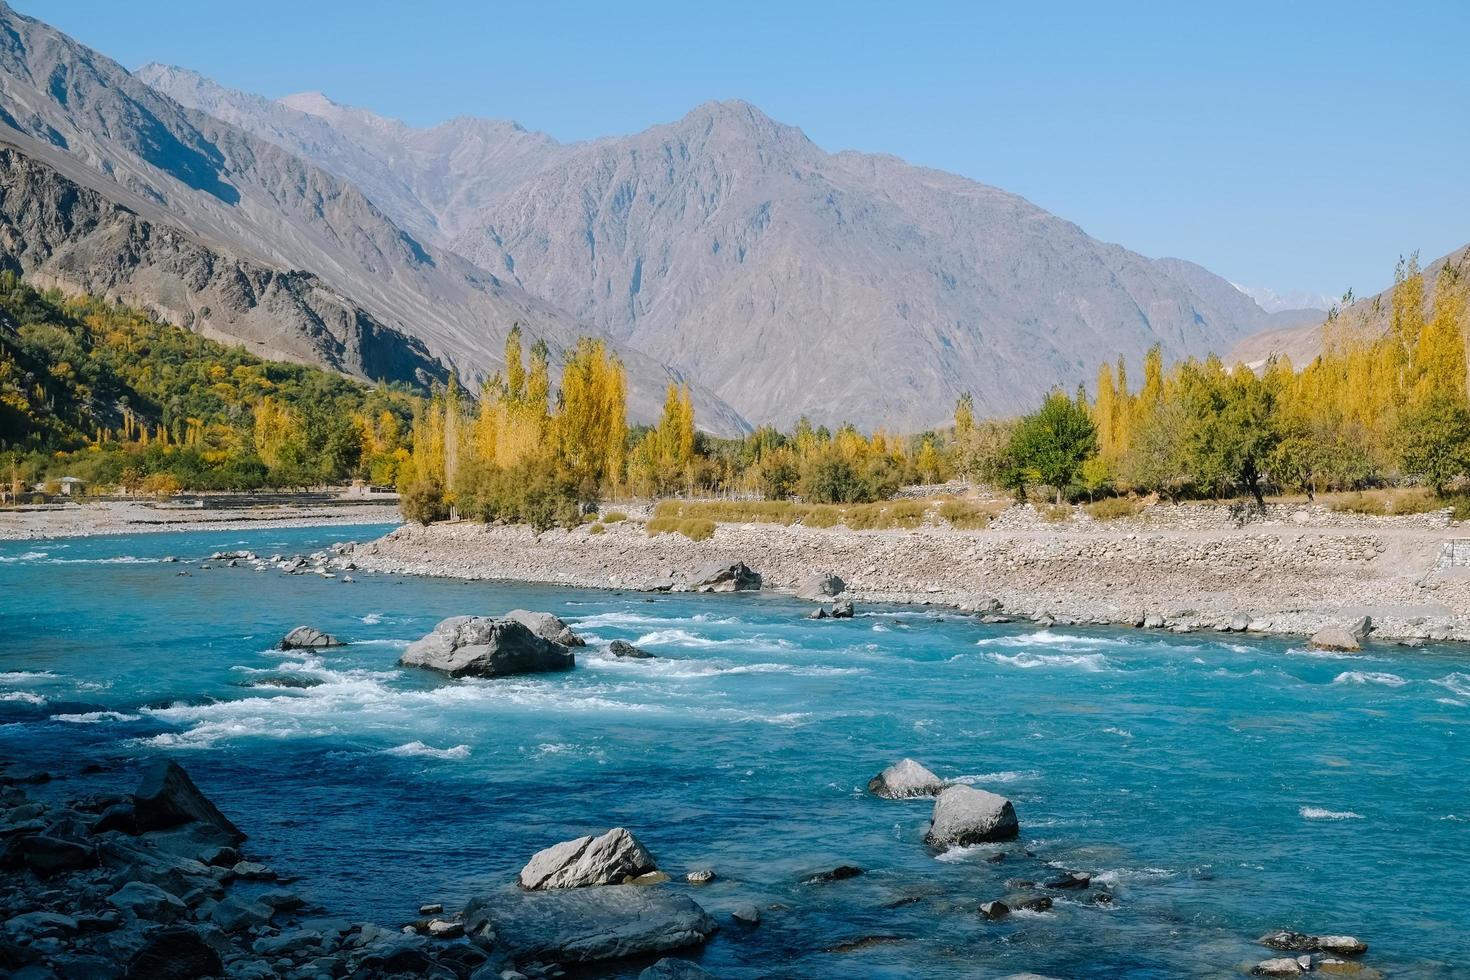 türkisblauer Fluss foto